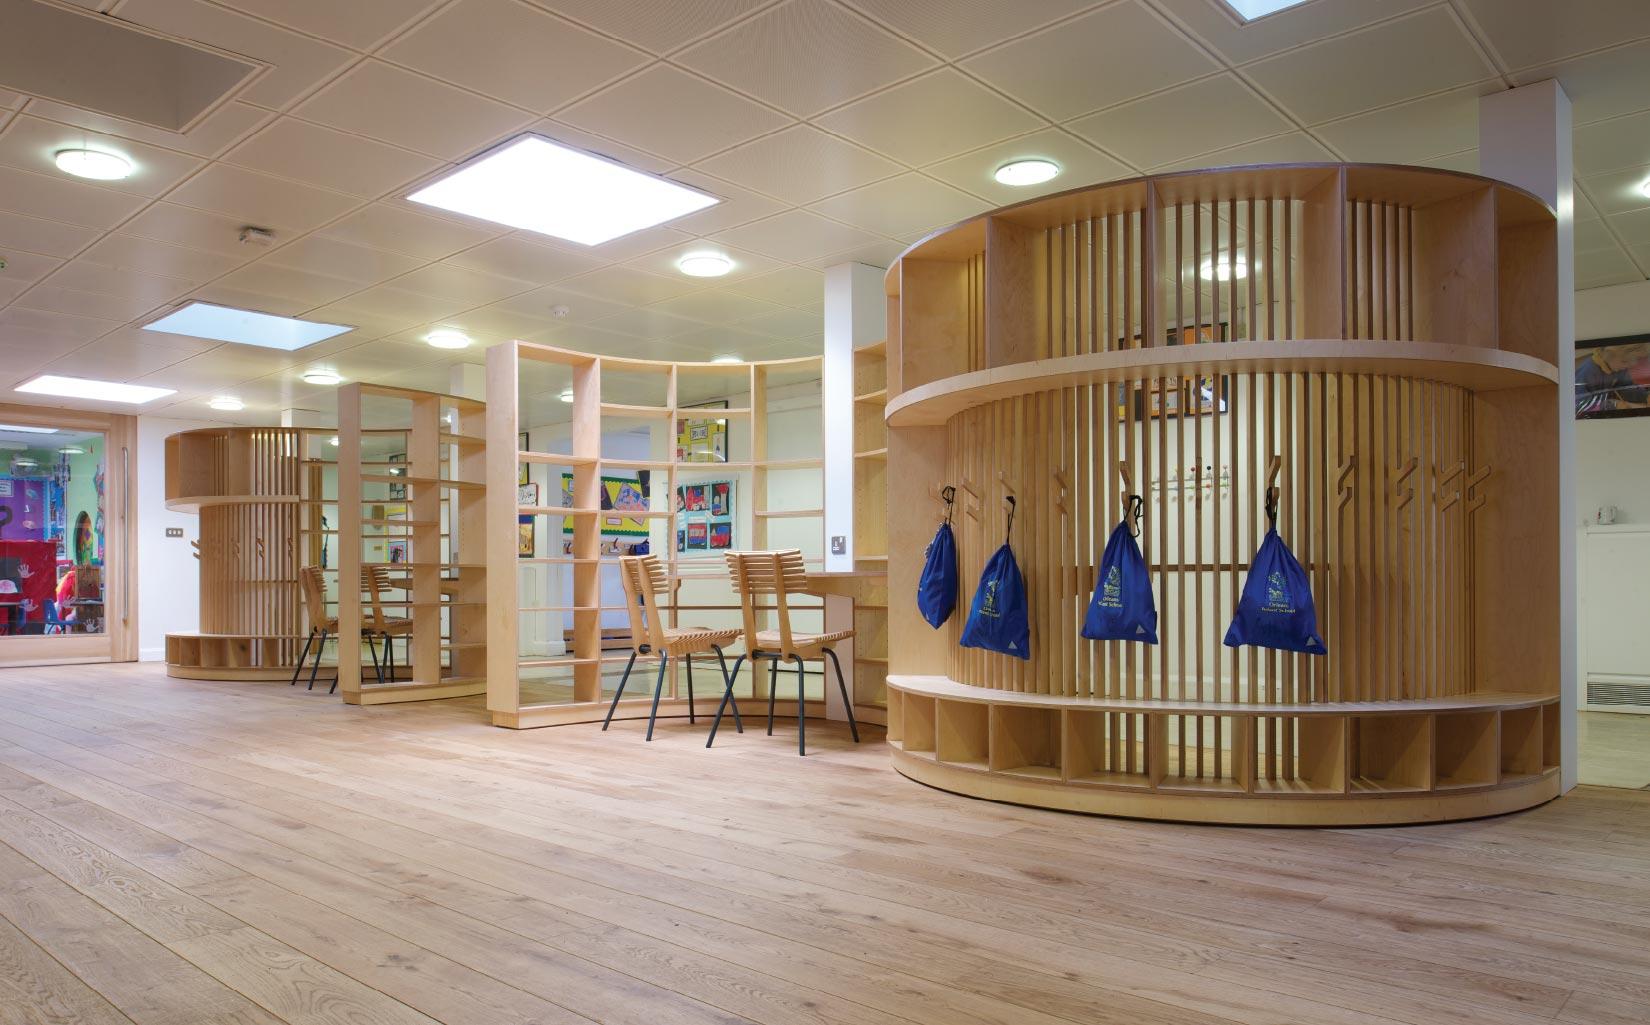 Orleans School, Twickenham, London, Bespoke Furniture Design seating area and clothes hooks